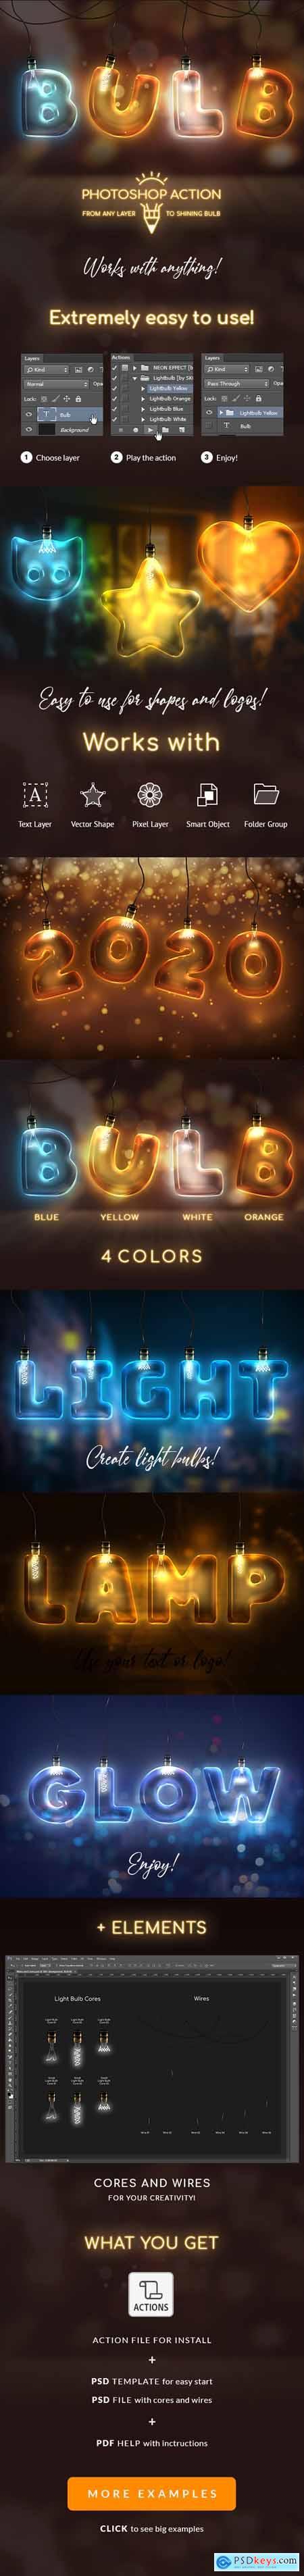 Light Bulb - Photoshop Action 25602135